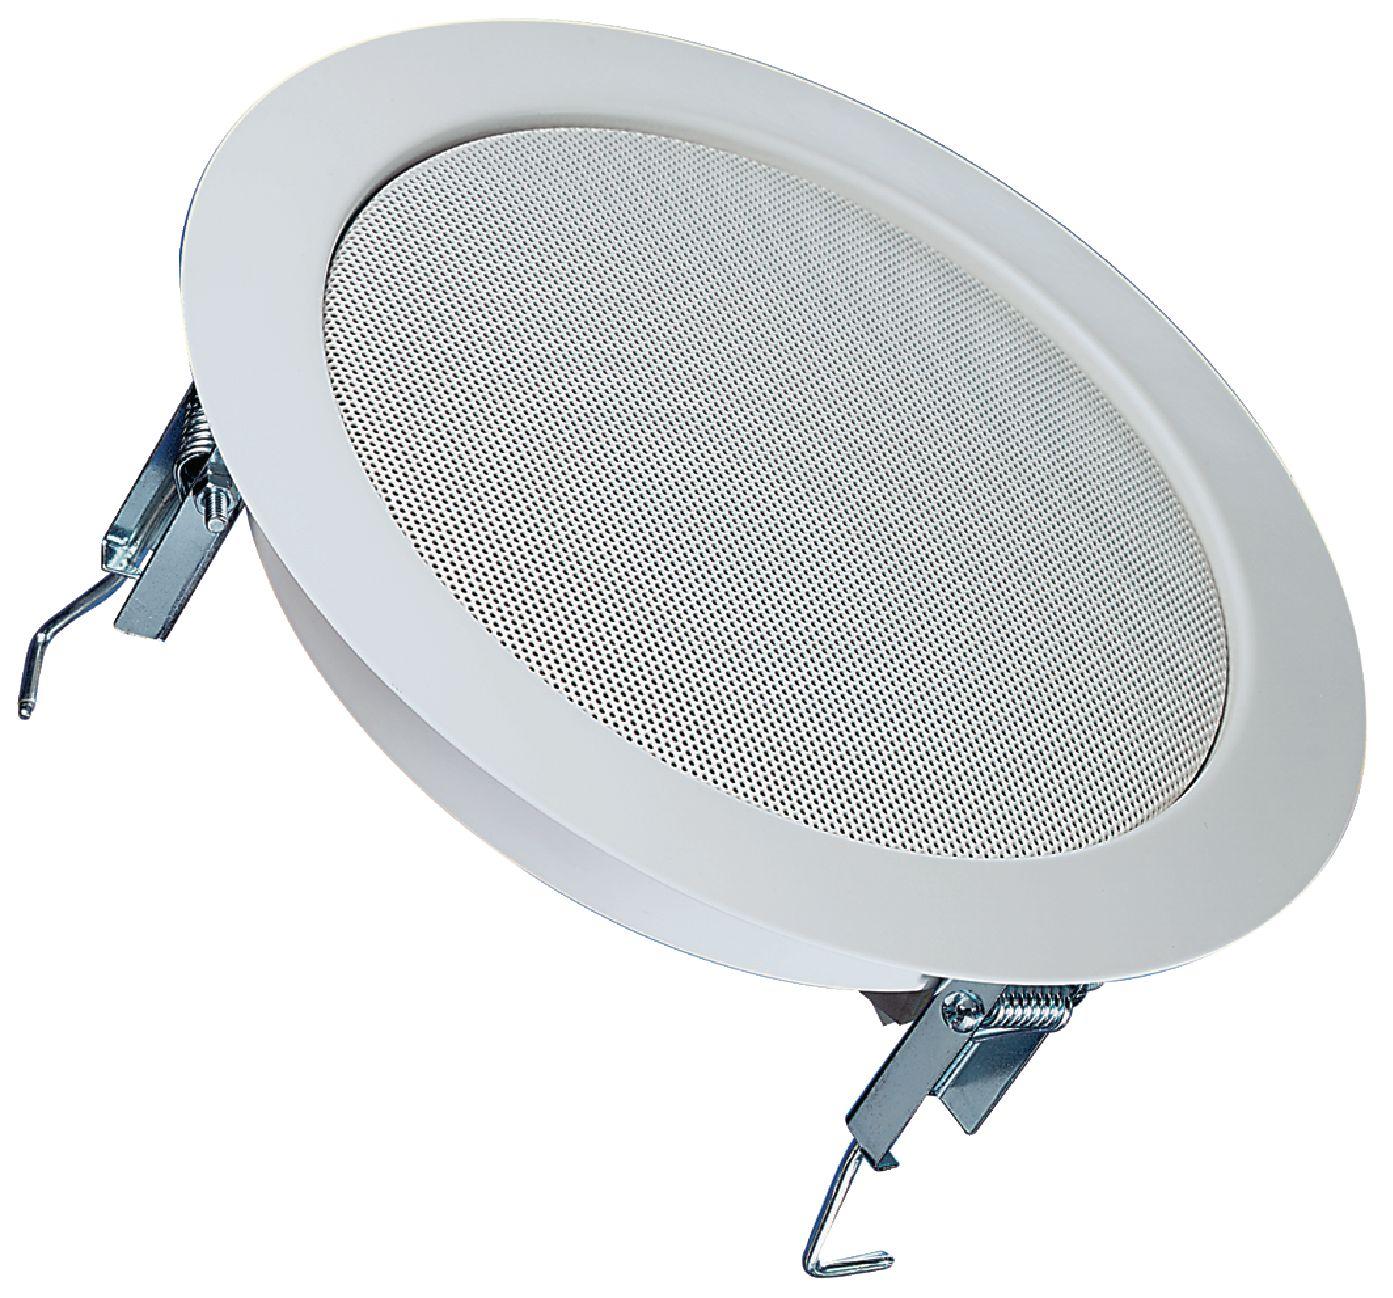 vs dl18 2 visaton haut parleur plafonnier hi fi 17 cm 6 5 100 v electronic. Black Bedroom Furniture Sets. Home Design Ideas